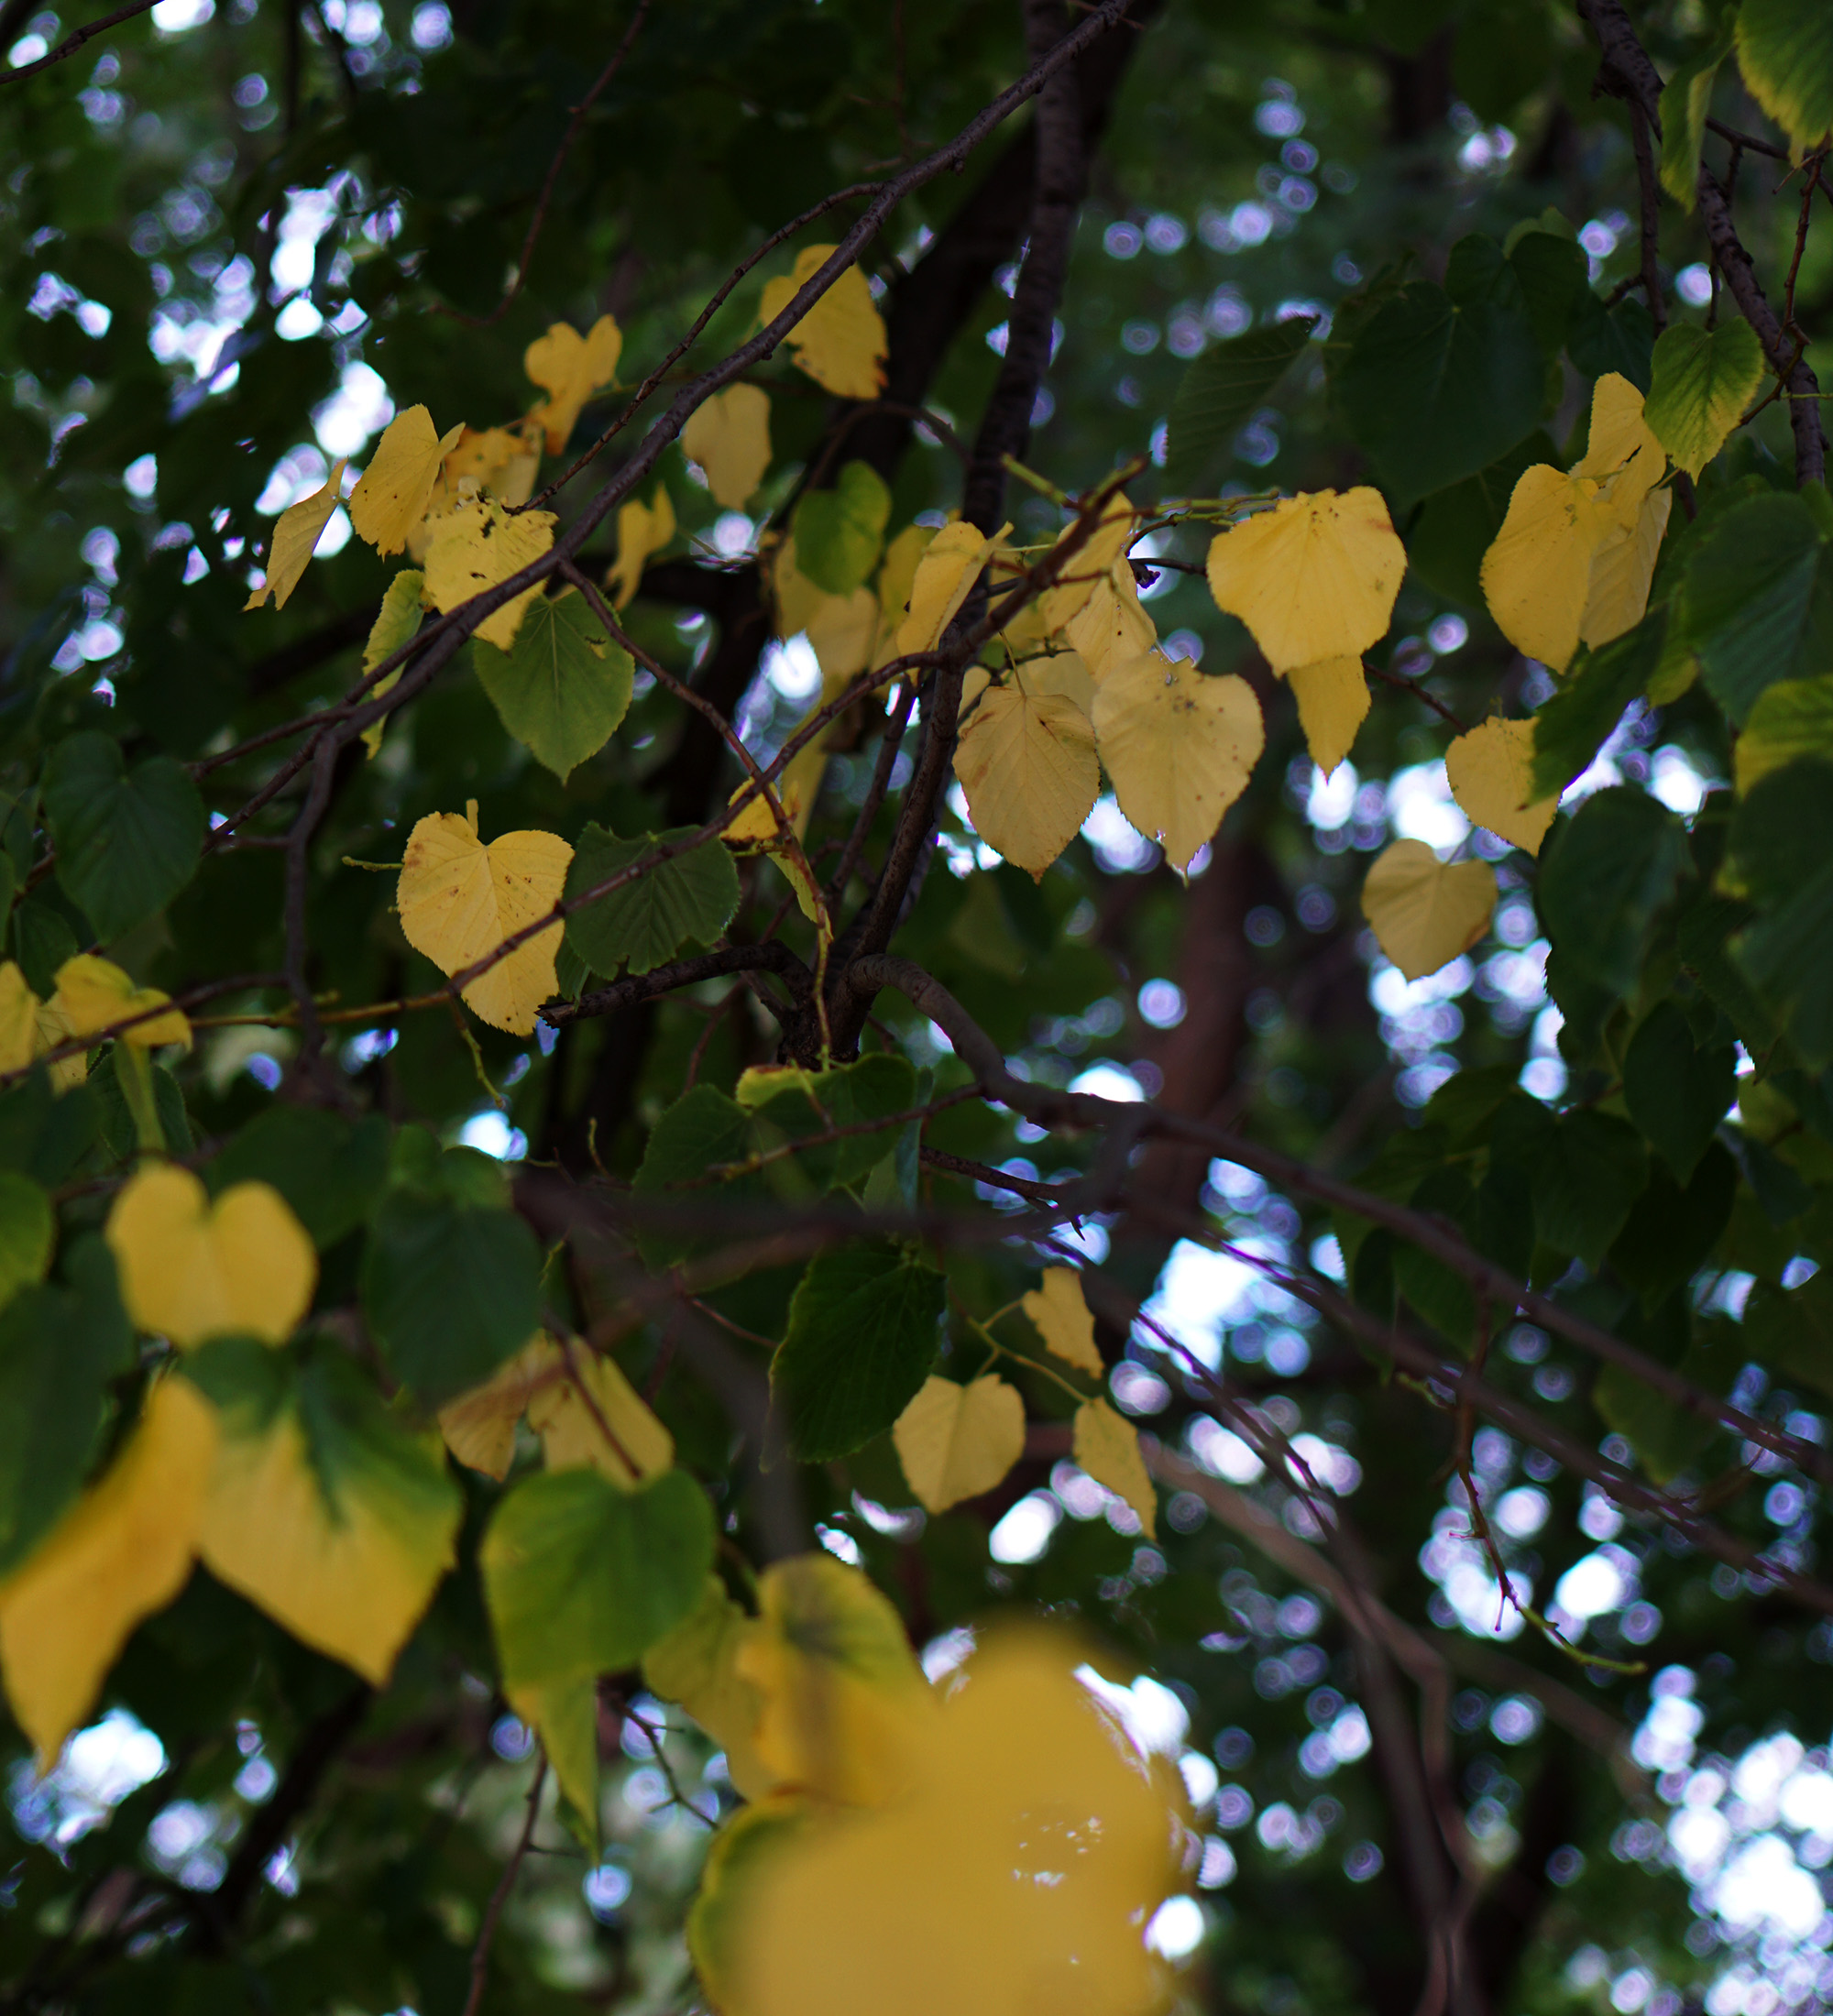 Leaves turning yellow / Darker than Green